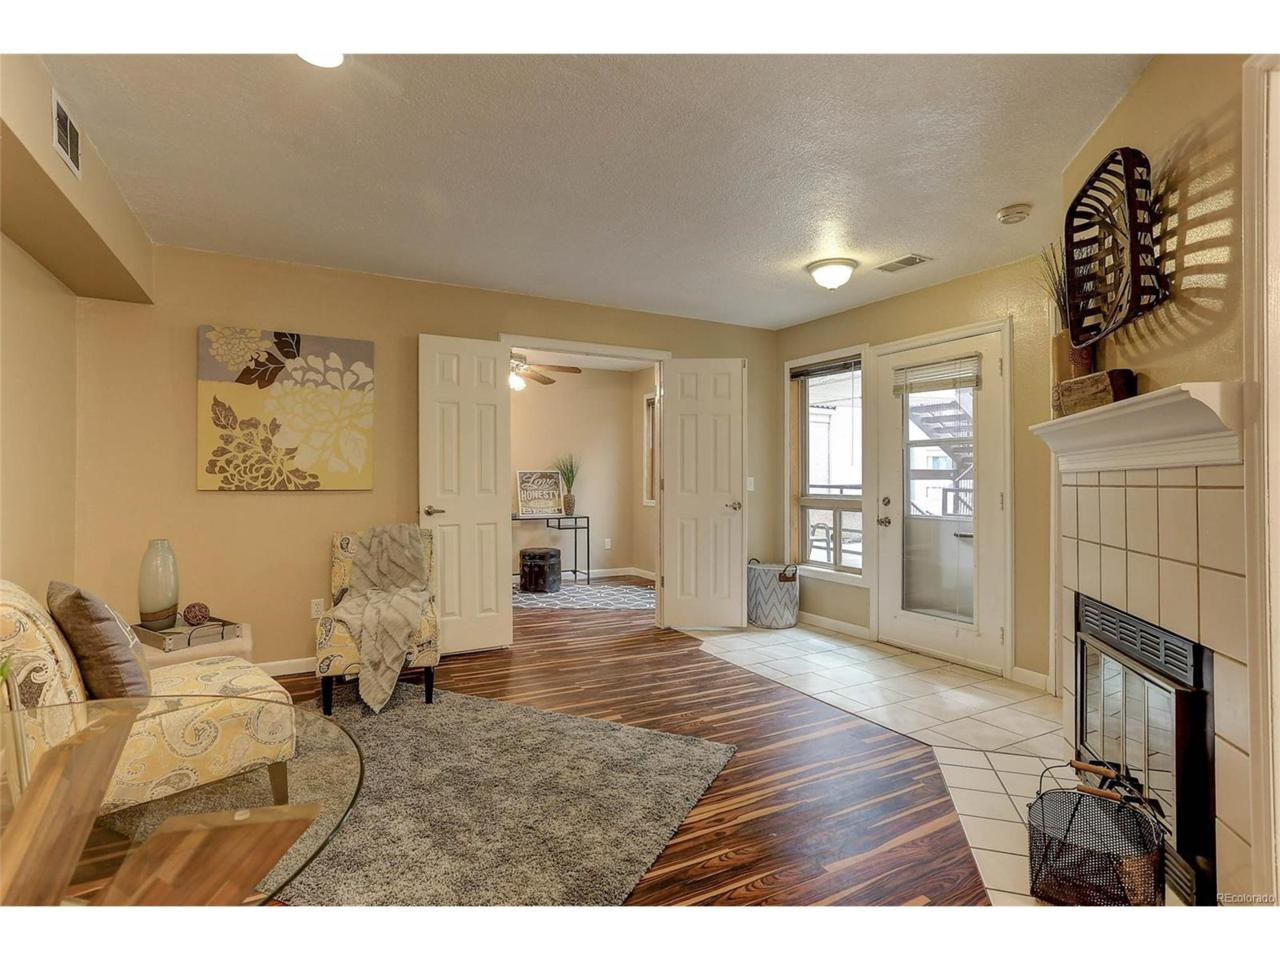 1845 Kendall Street 225C, Lakewood, CO 80214 (MLS #8888154) :: 8z Real Estate